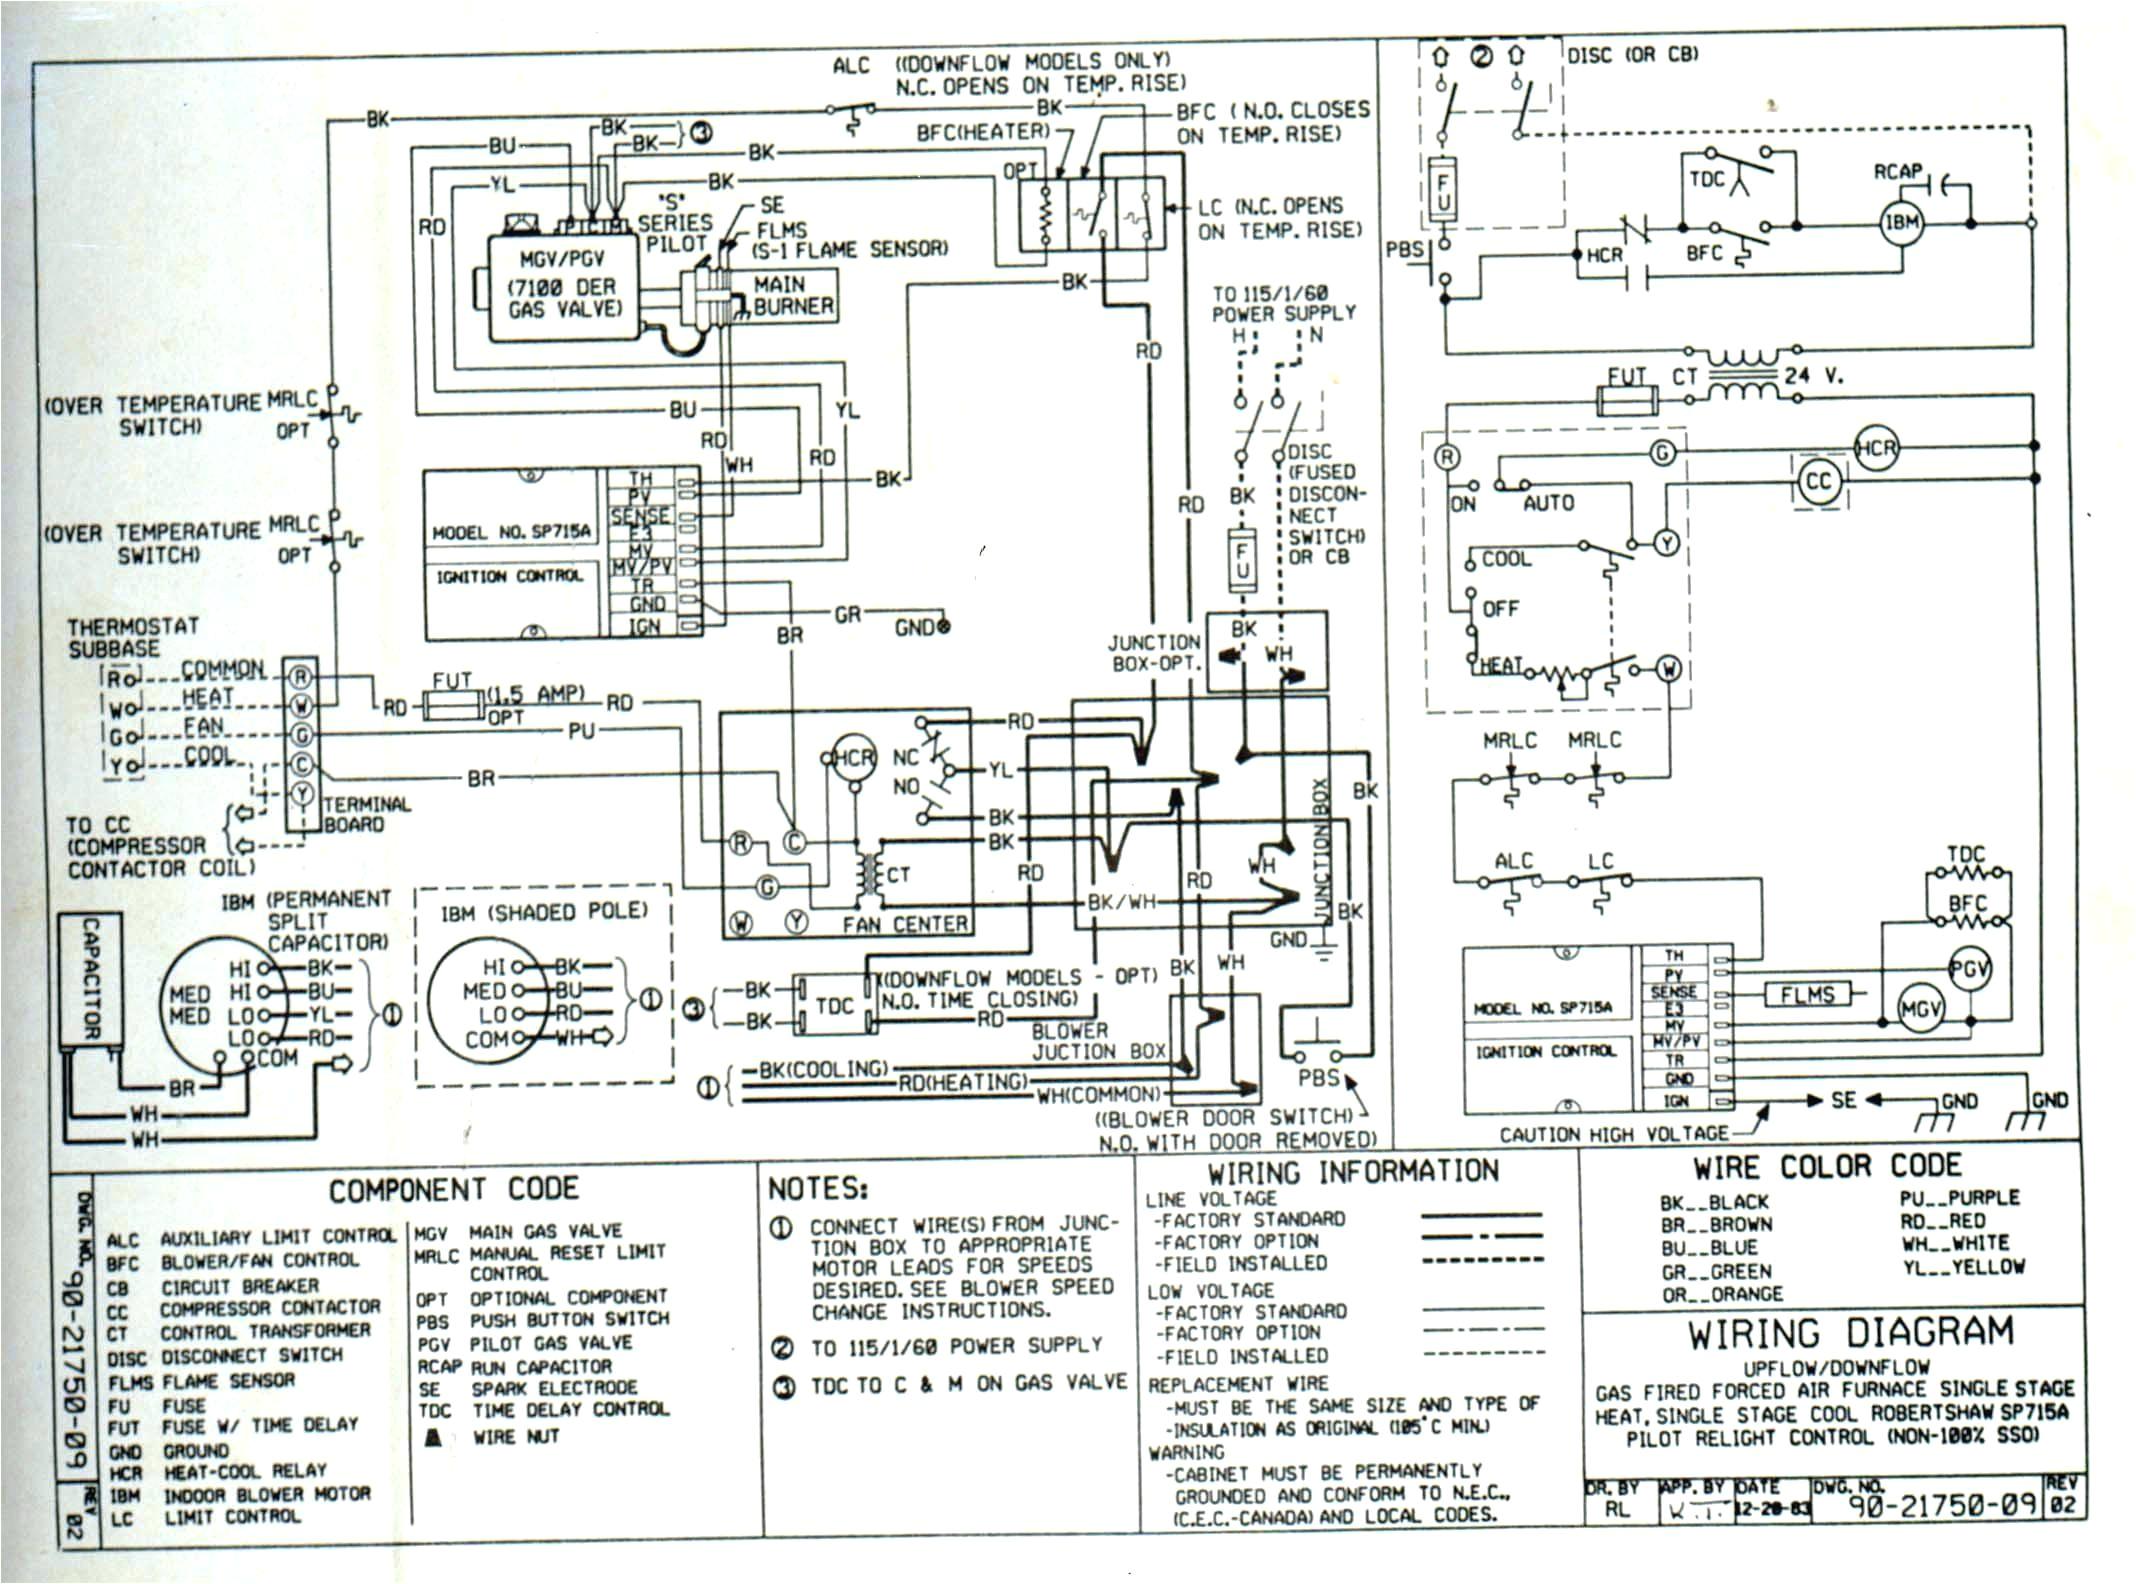 payne package unit wiring diagram payne package unit wiring diagram new trane air handler wiring diagram quot 6f jpg